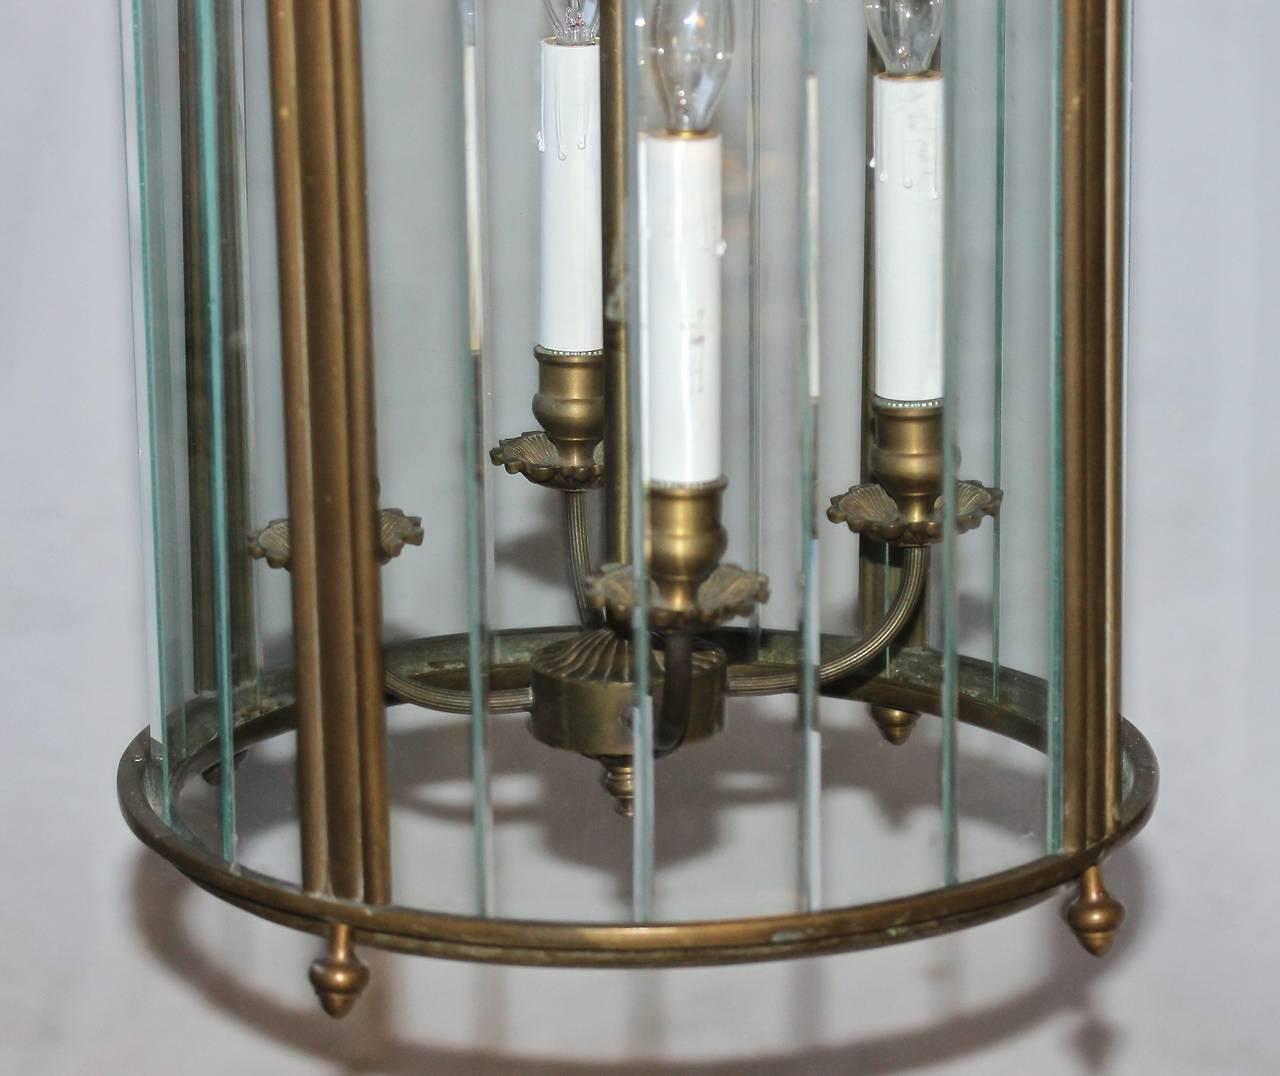 Large Italian Neoclassic Bronze Hall Lantern Pendant Light For Sale 3